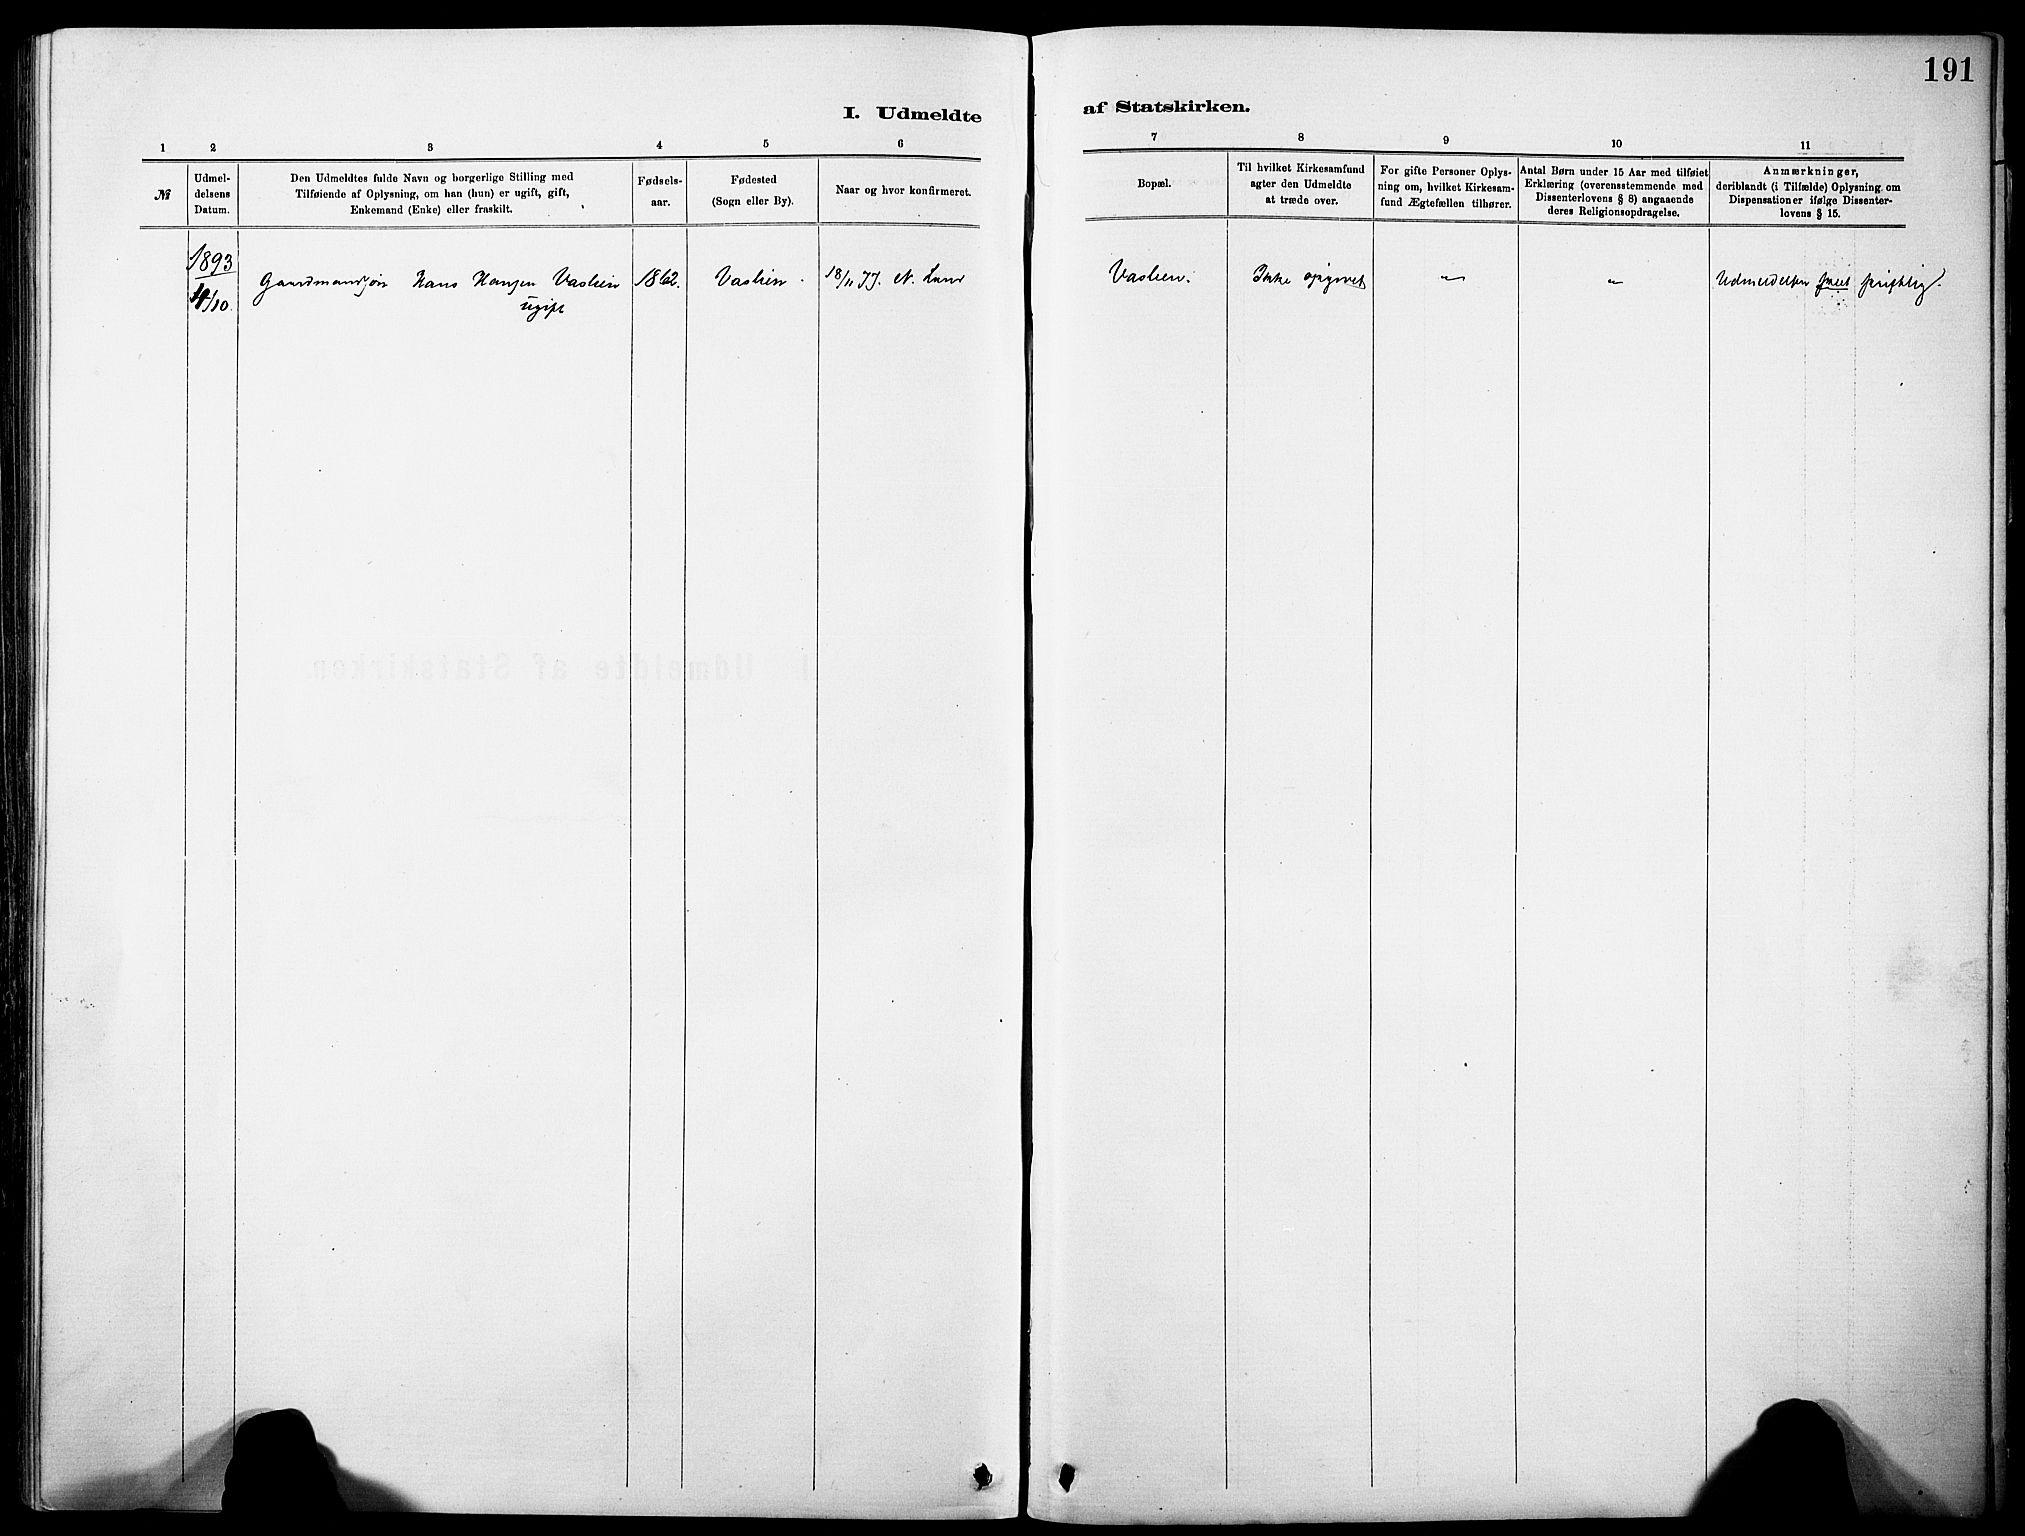 SAH, Nordre Land prestekontor, Ministerialbok nr. 5, 1882-1903, s. 191